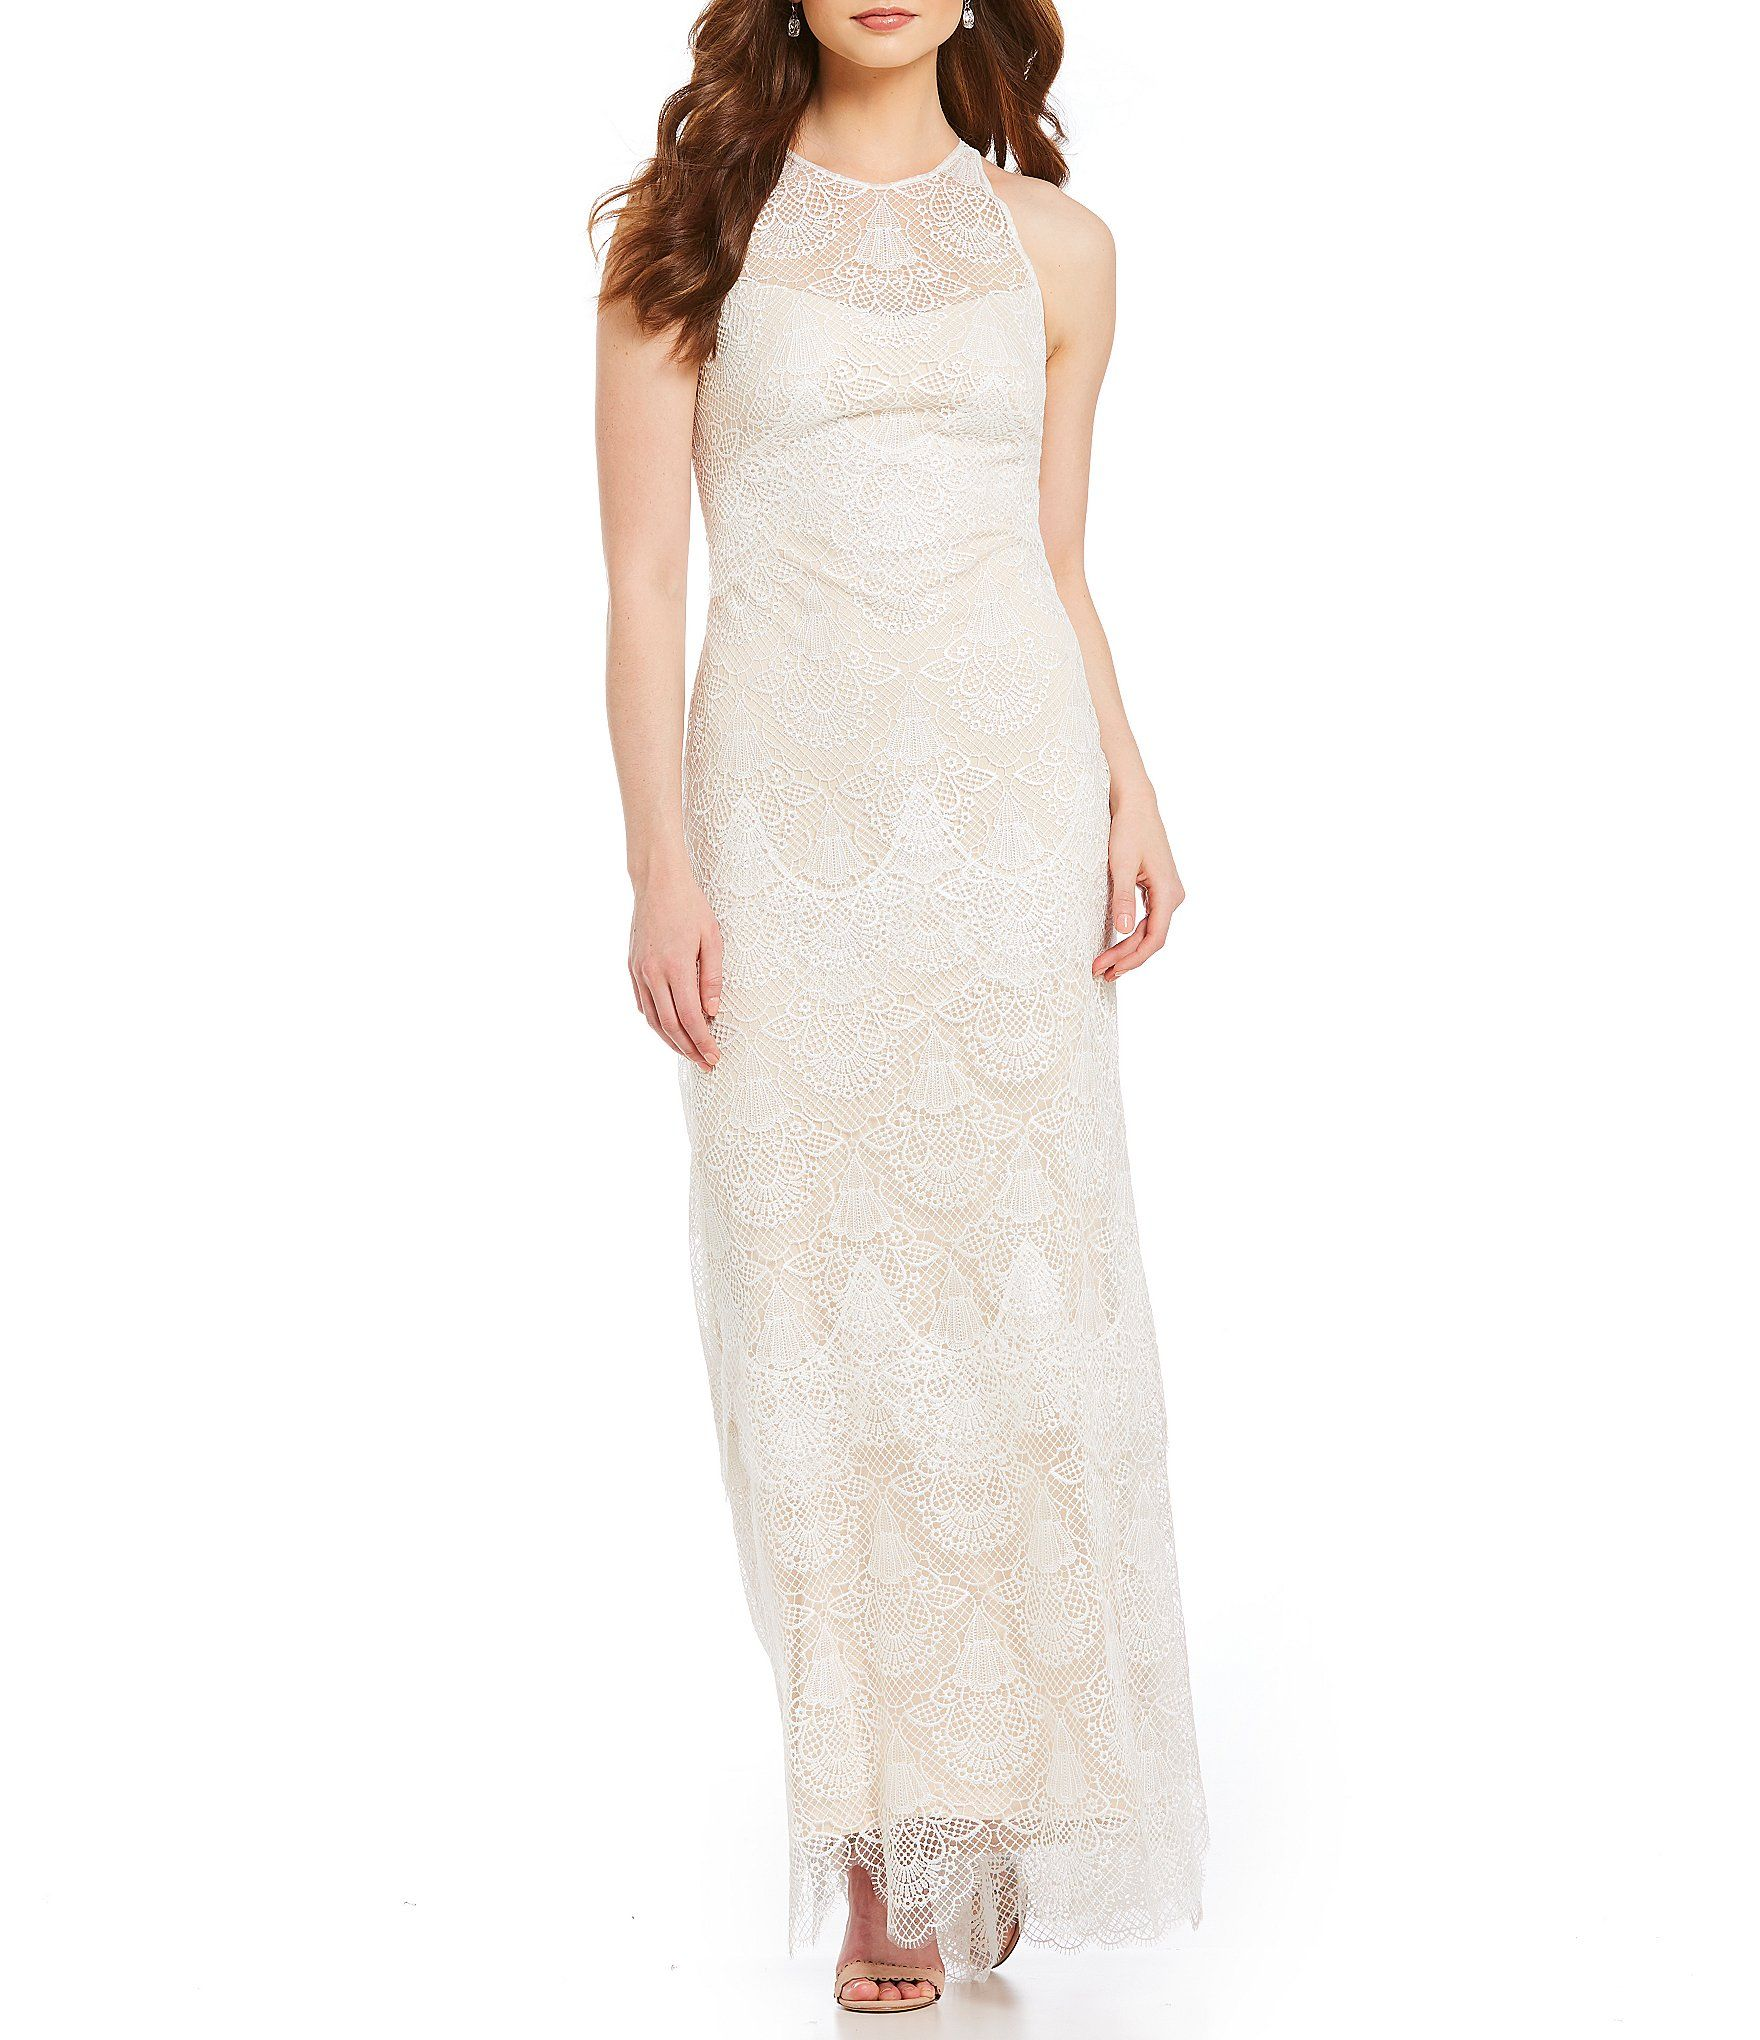 Tadashi Shoji Scalloped Lace Gown Dillards Lace Gown Lace Evening Dresses White Gown Dress [ 2040 x 1760 Pixel ]